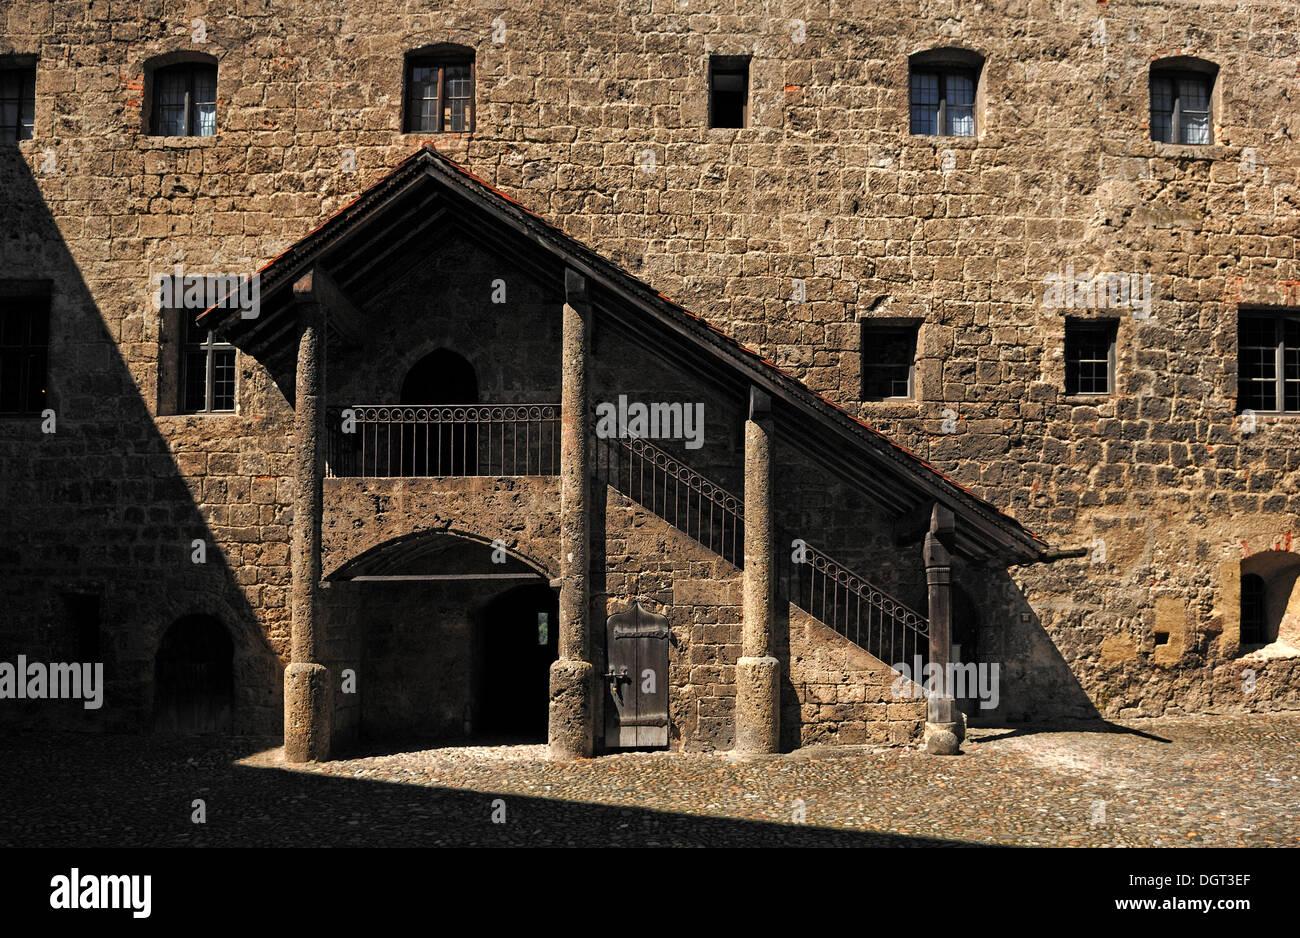 Überdachte Treppe im Innenhof der Hauptburg, 1525, Burg Nr. 48, Burghausen, Oberbayern Stockbild